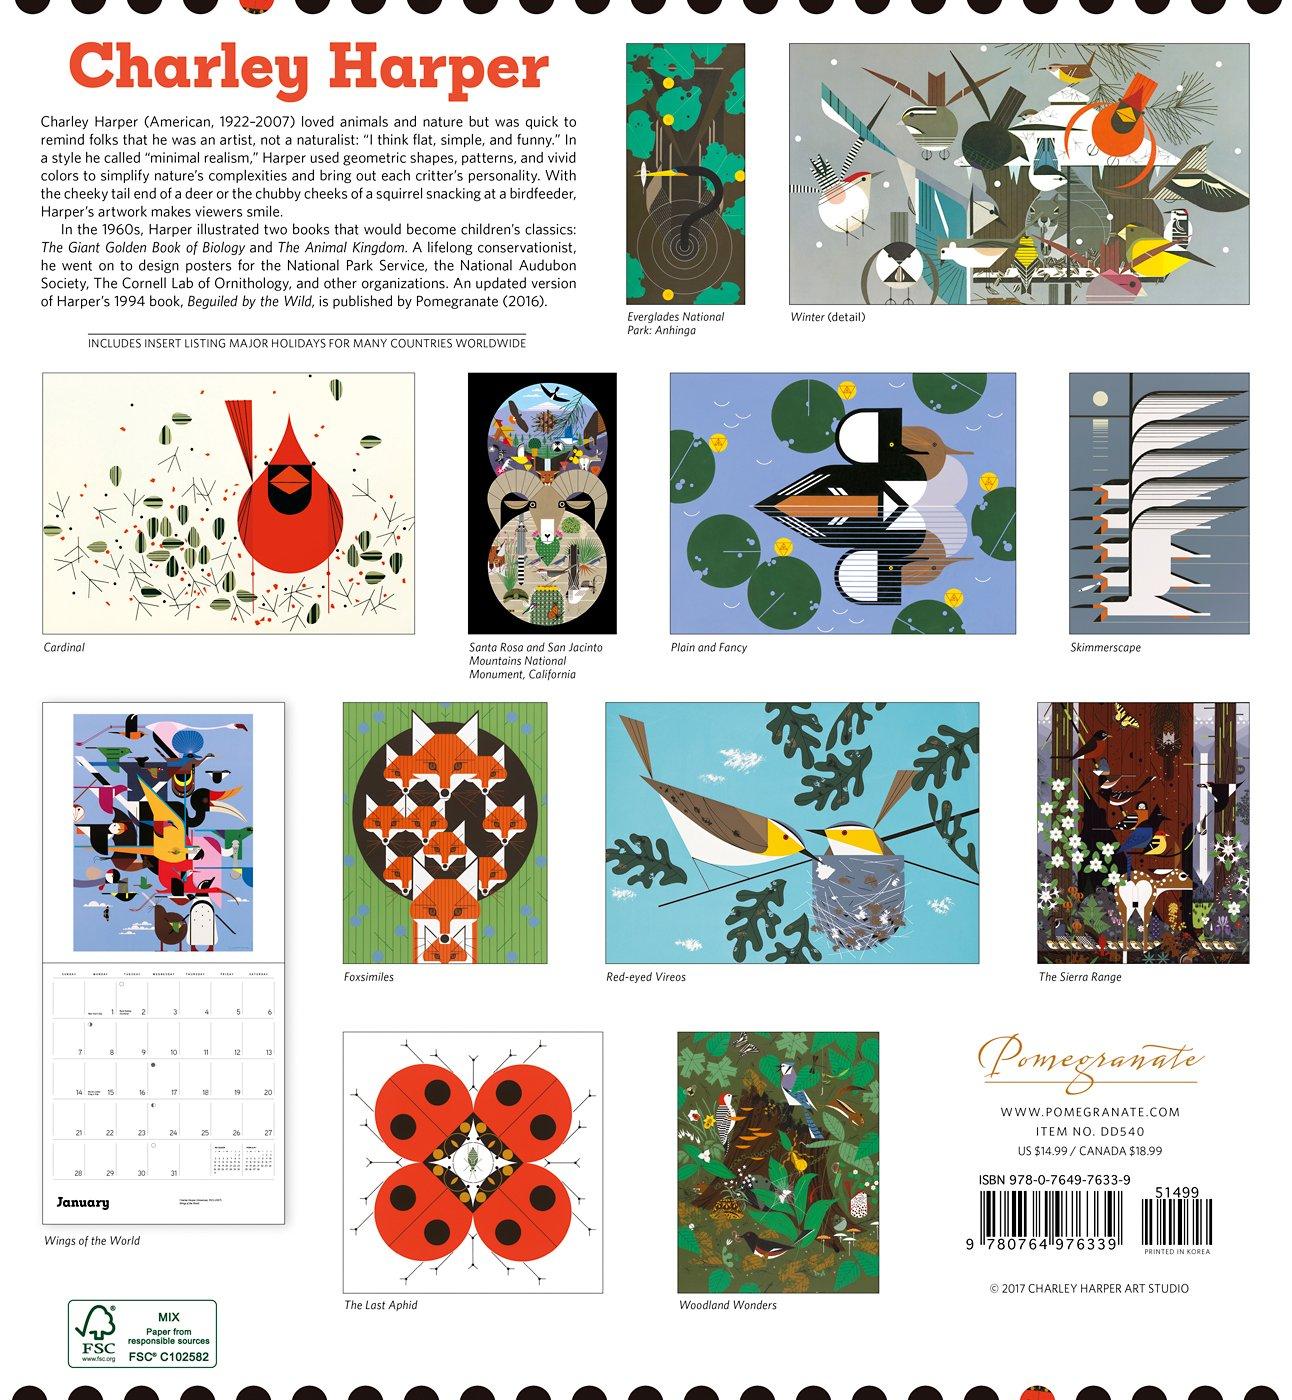 Charley Harper 2018 Wall Calendar: Charley Harper: 9780764976339:  Amazon.com: Books